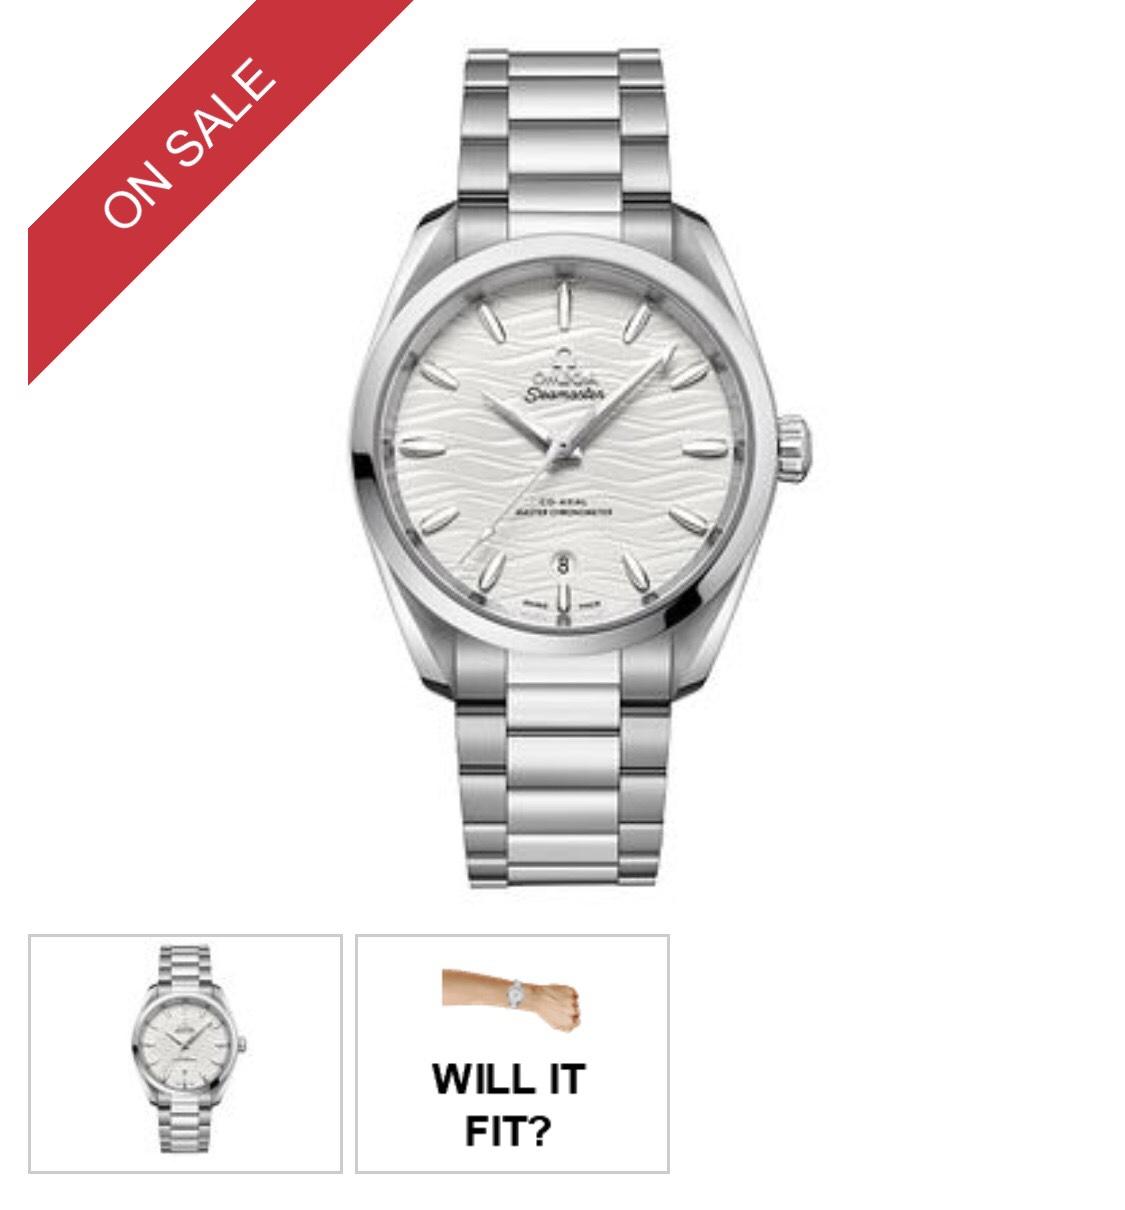 Omega Seamaster Aqua Terra Bracelet Watch - £3,250.00 @ Ernest Jones + Free Delivery